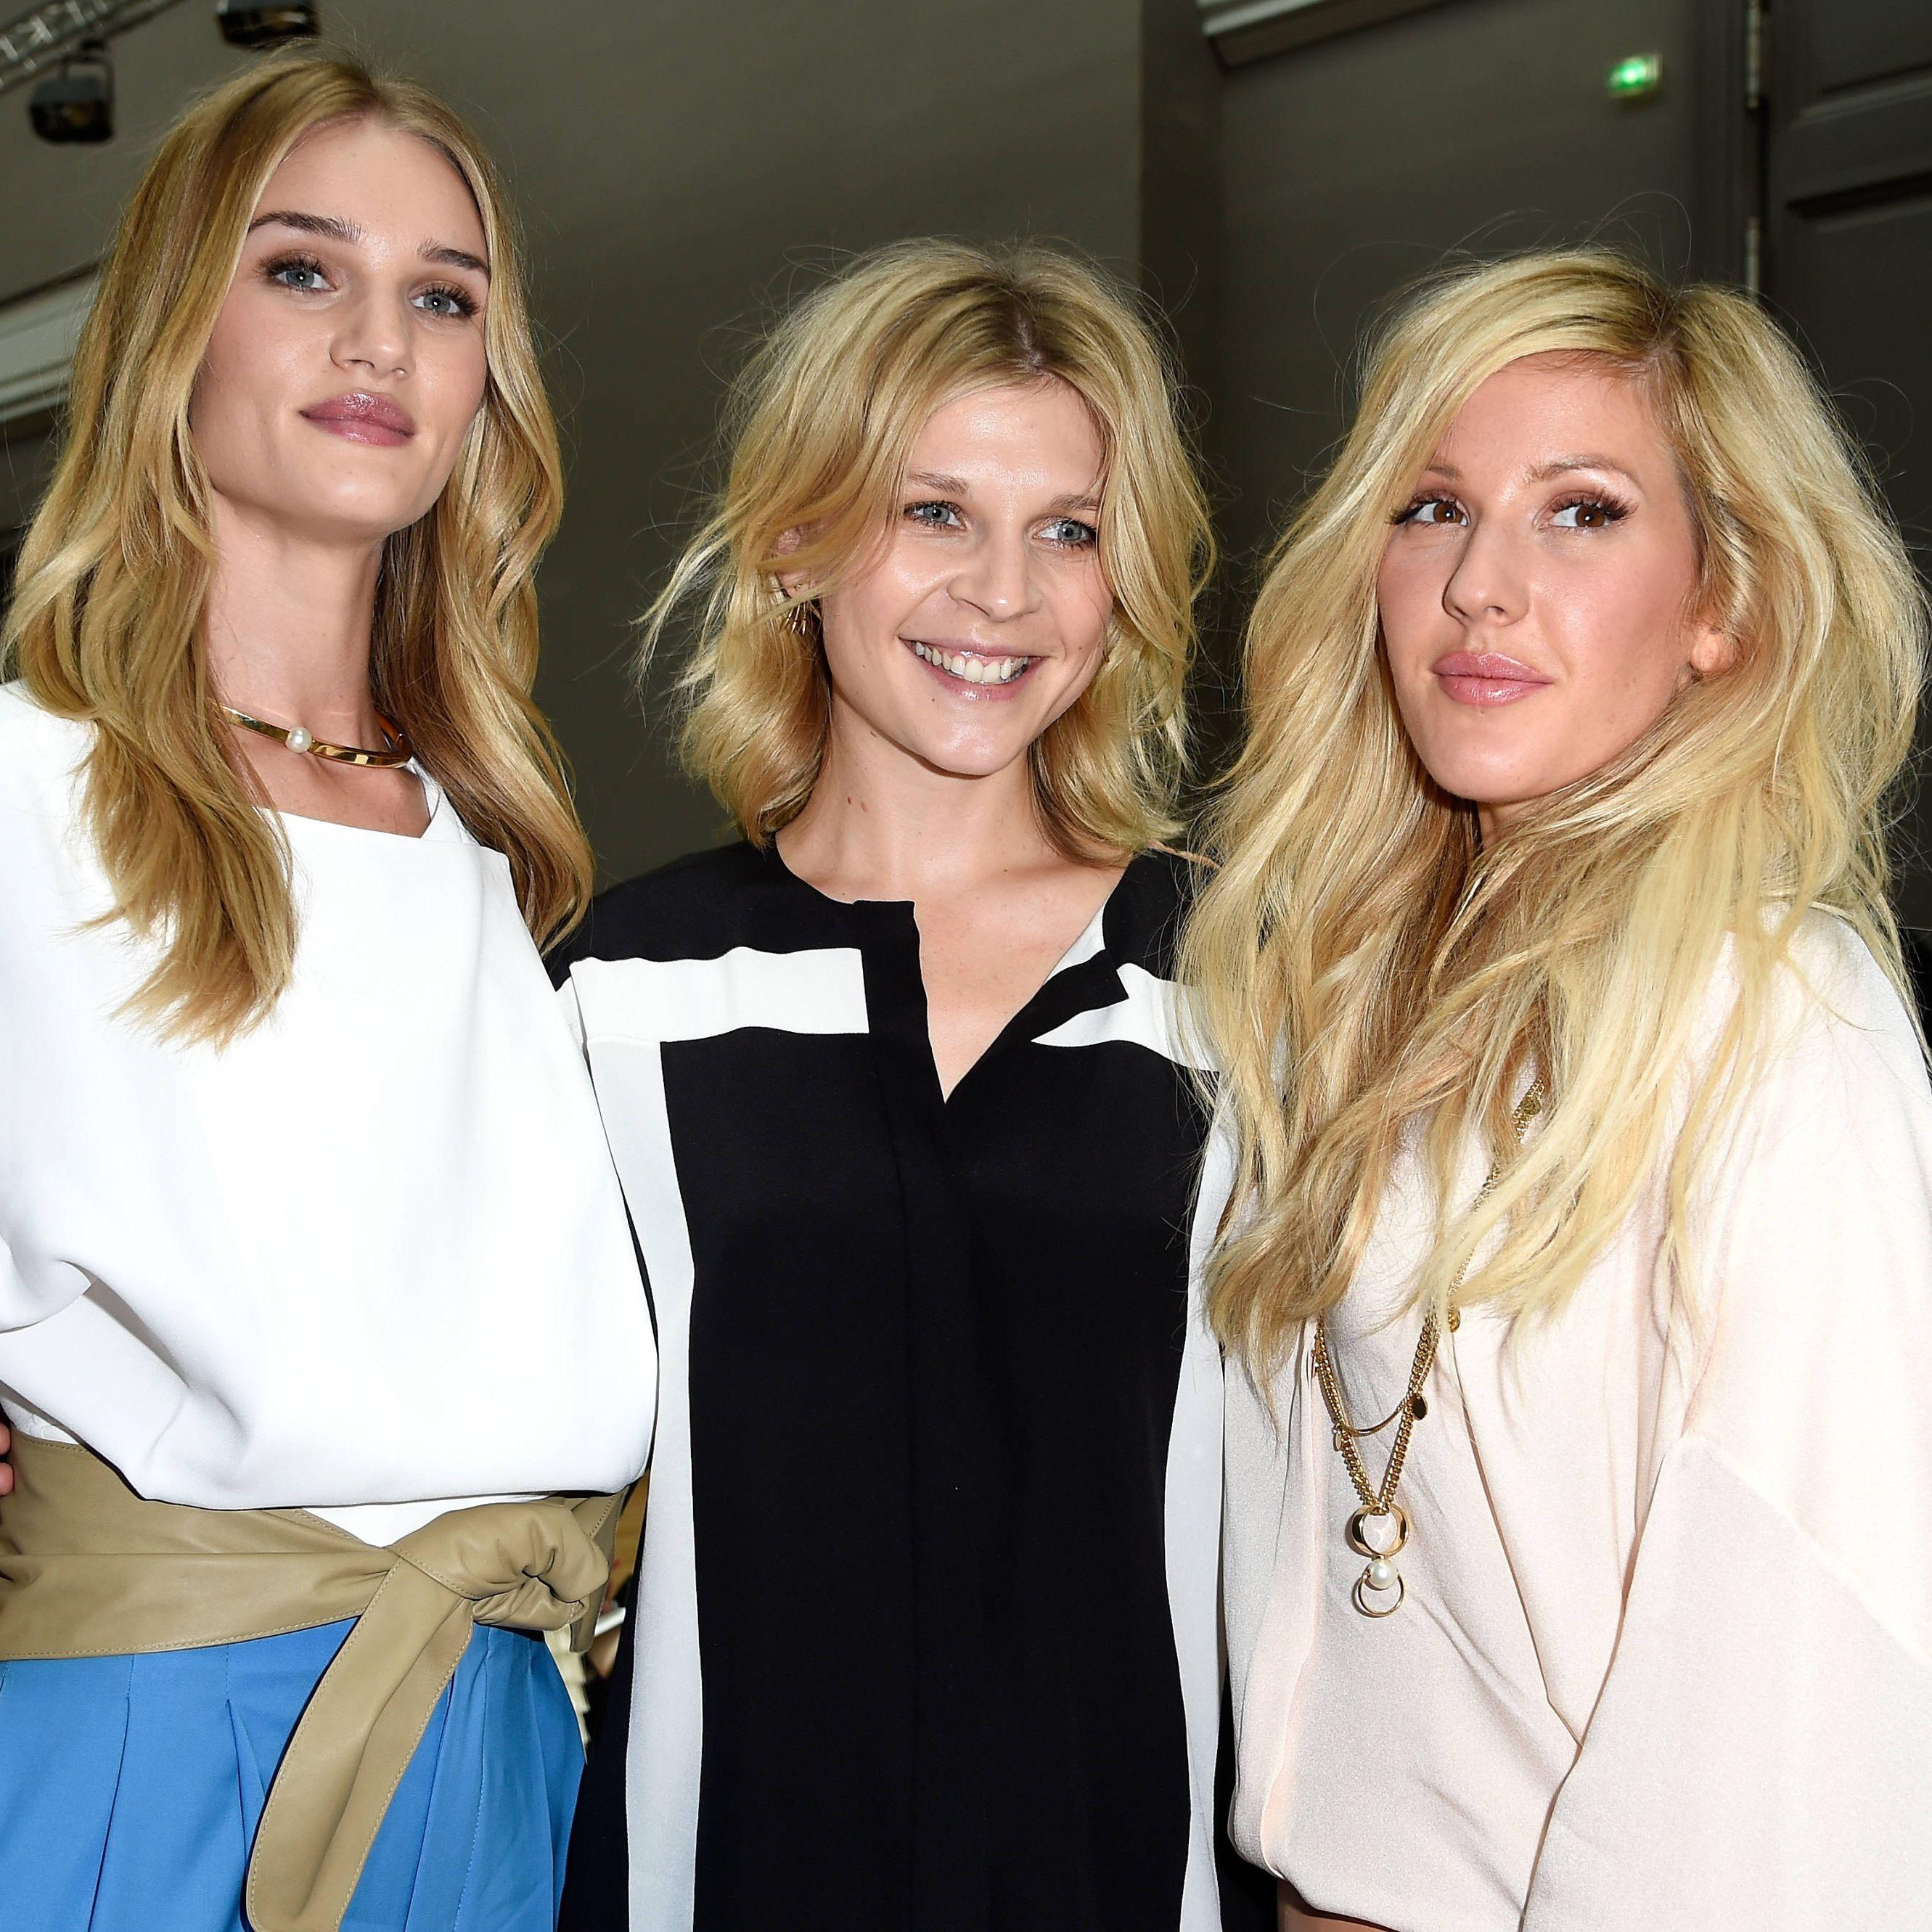 Rosie Huntington-Whiteley, Clemence Poesy, Ellie Goulding at Paris Fashion Week Spring/Summer 2015